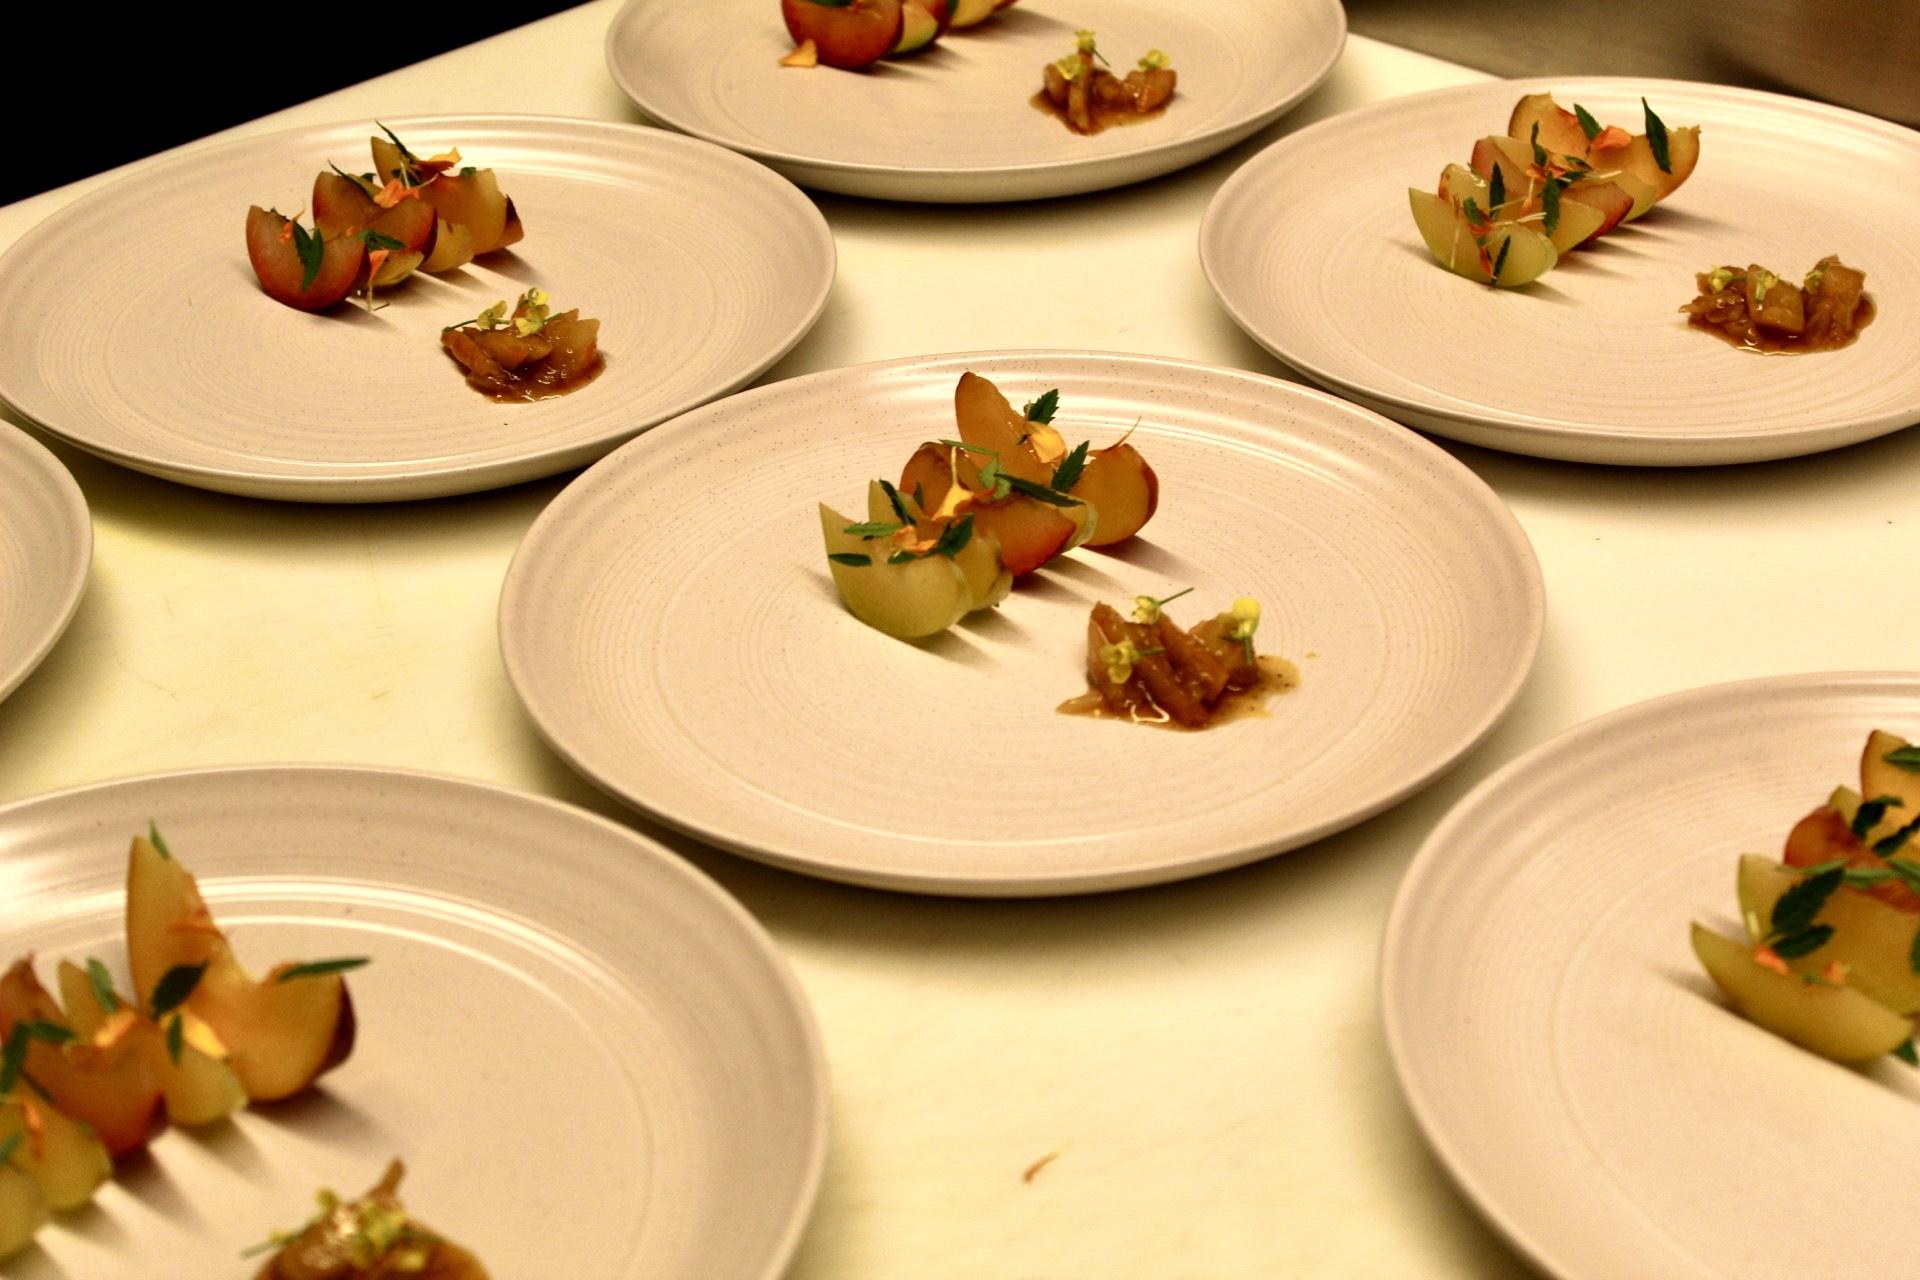 Shrimp and Stone Fruit with Marigold